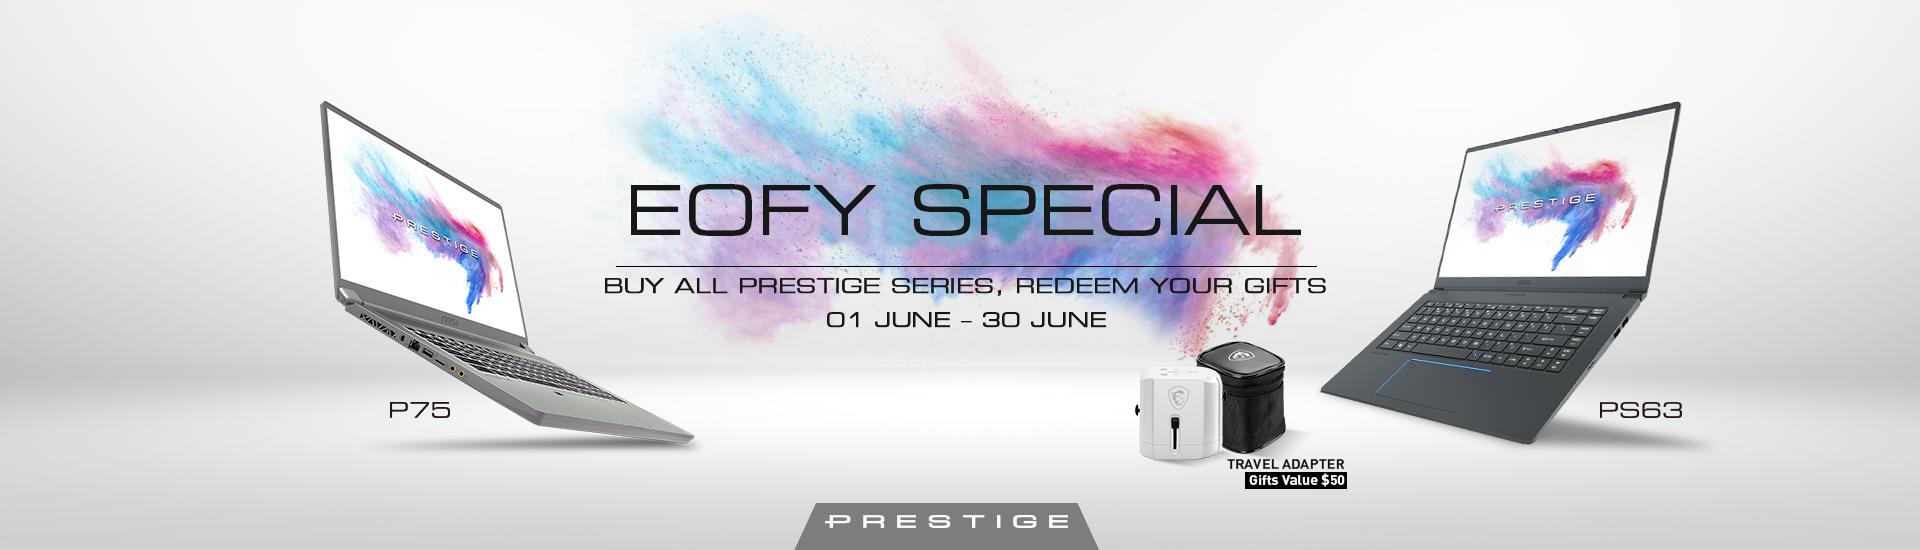 EOFY-Prestige-Laptop-201